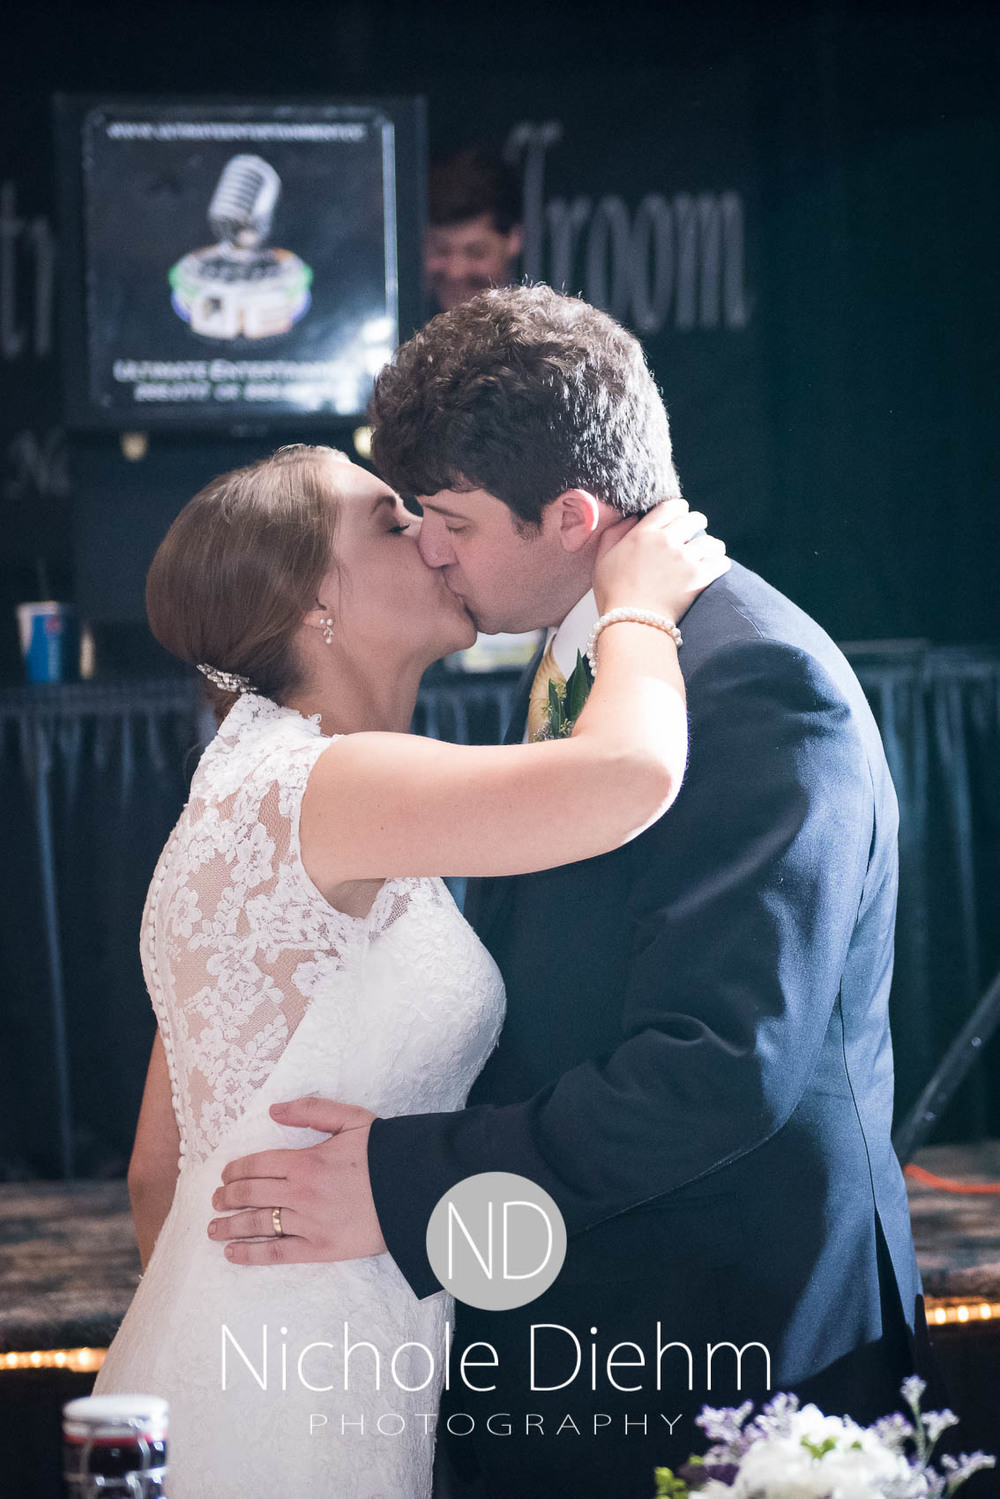 Katie-Schneider-Sam-Kelly-Wedding-Cedar-Falls-Iowa-Photographer-Nichole-Diehm-Photography-St.Stephens-Electric-Park-Ballroom-UNI1062.jpg